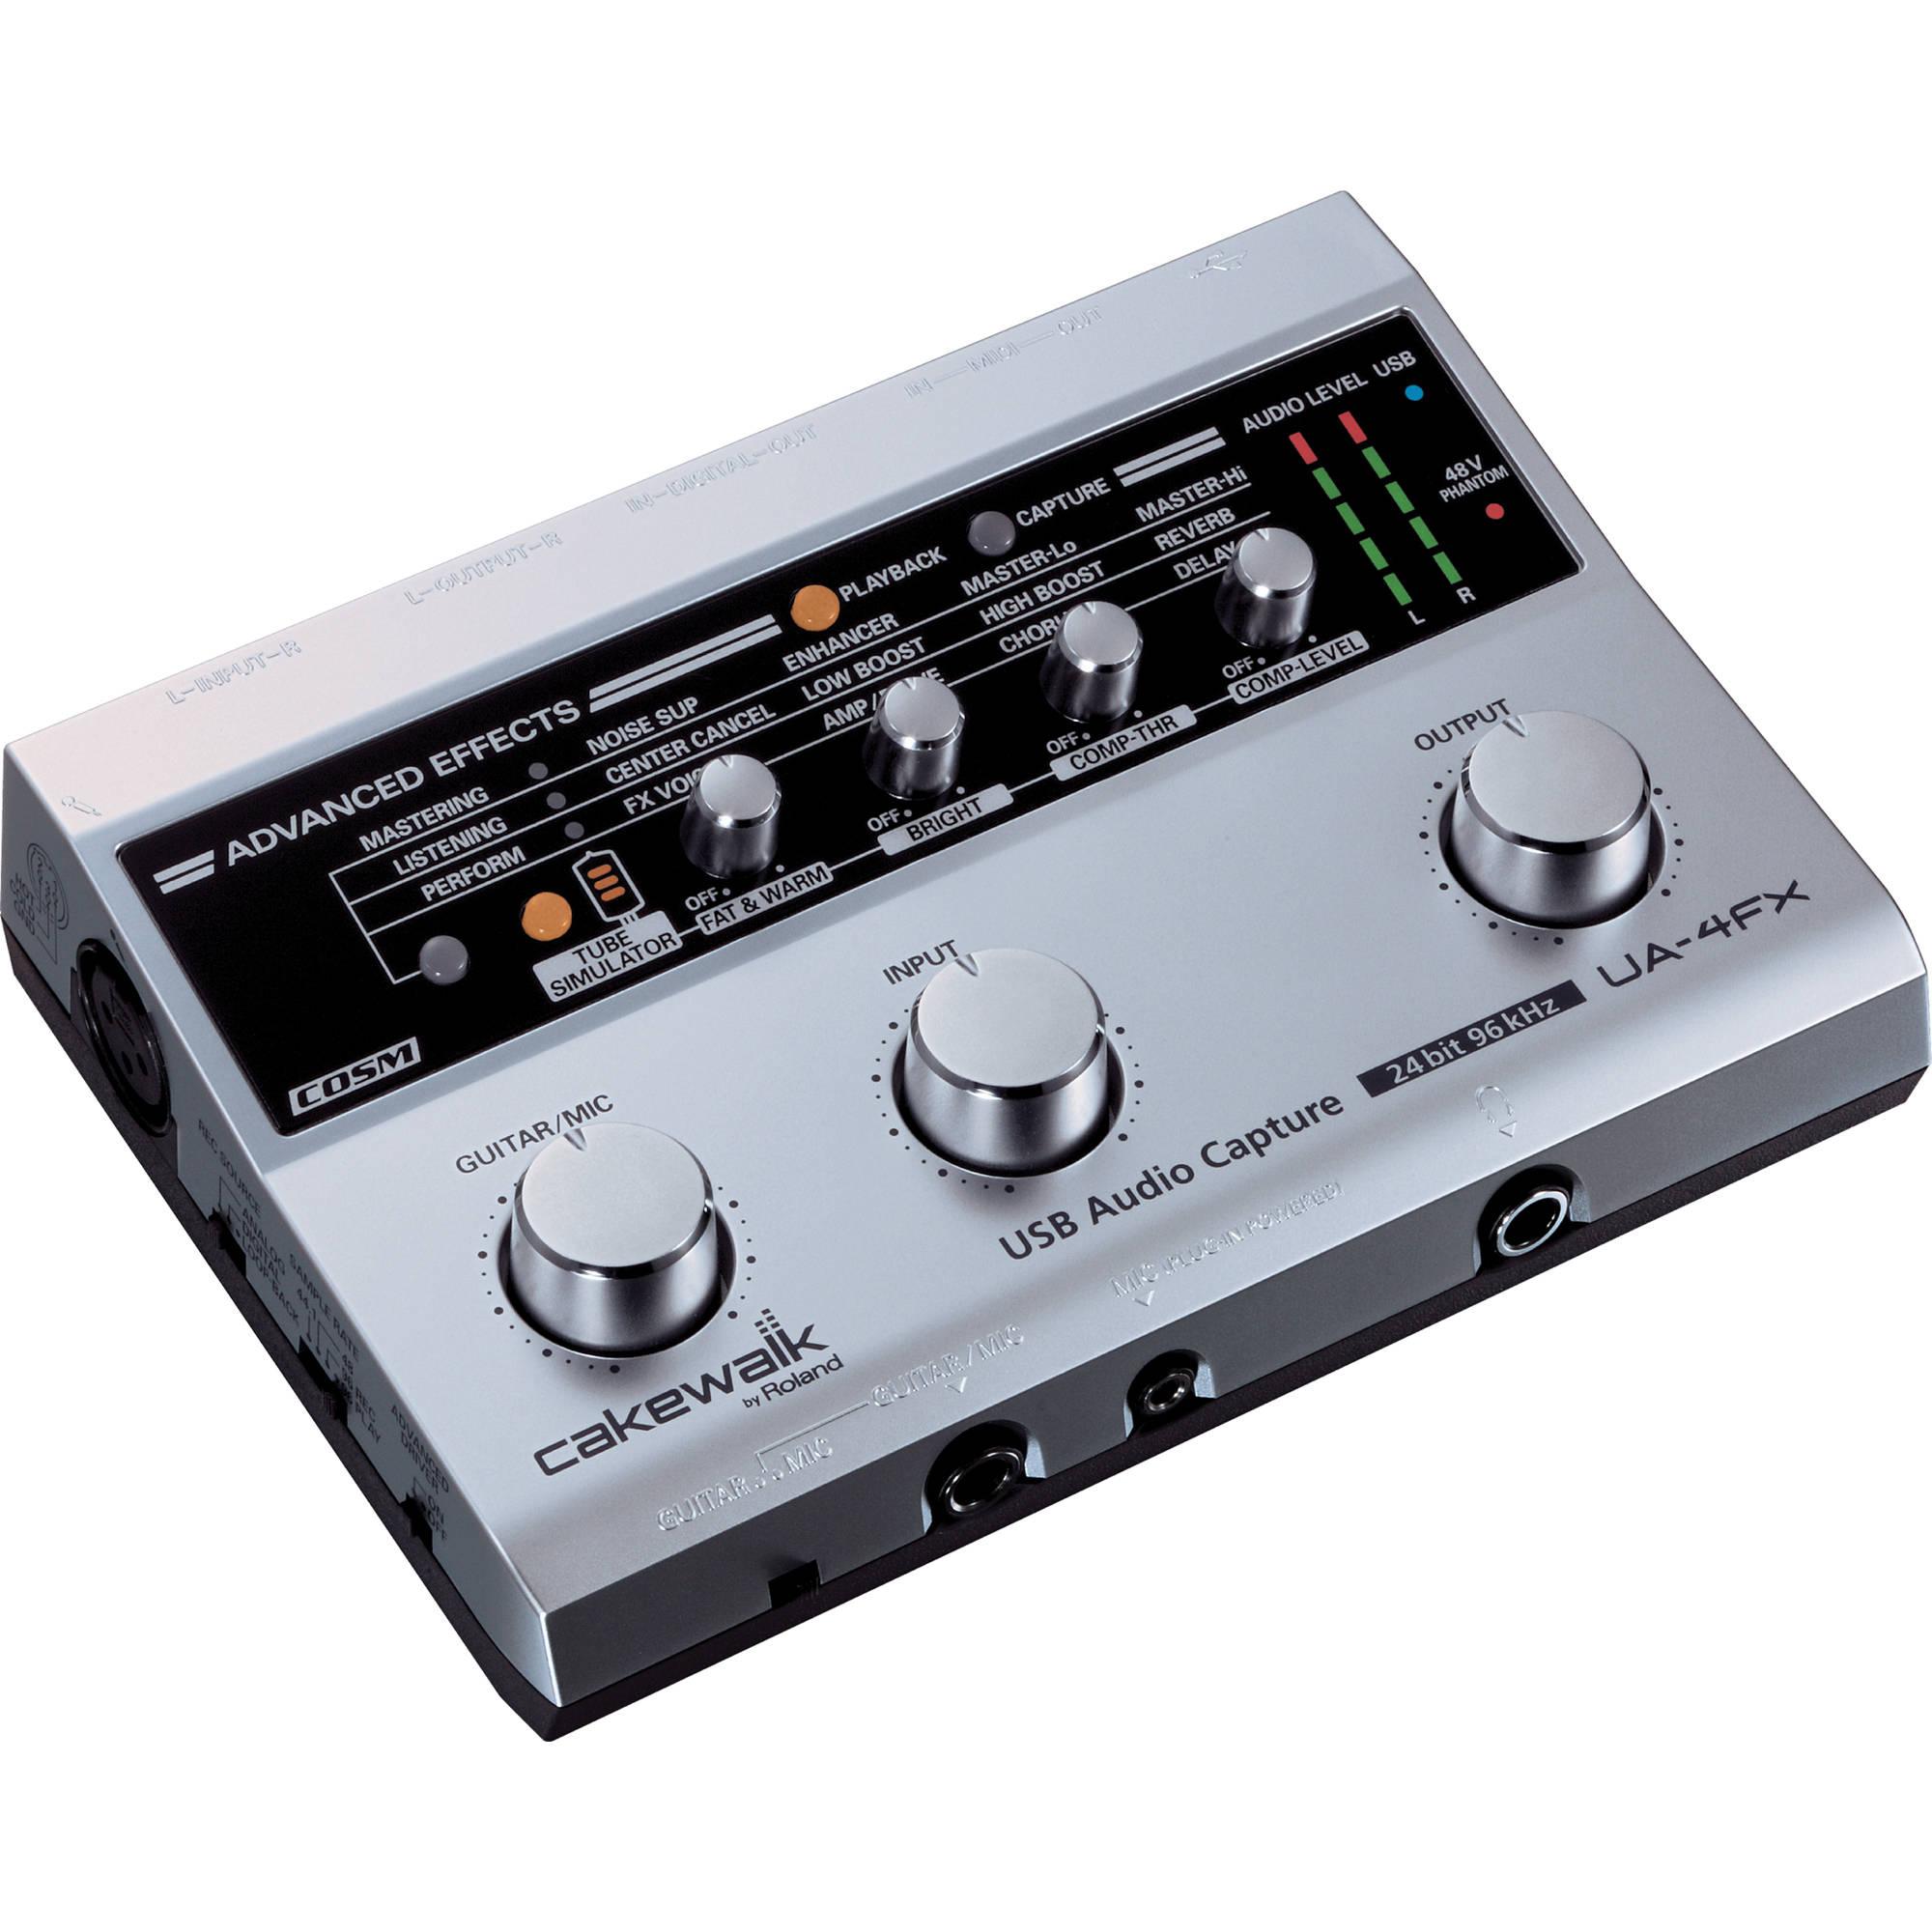 Roland UA-4FX - 2 x 2 USB Audio & MIDI Interface